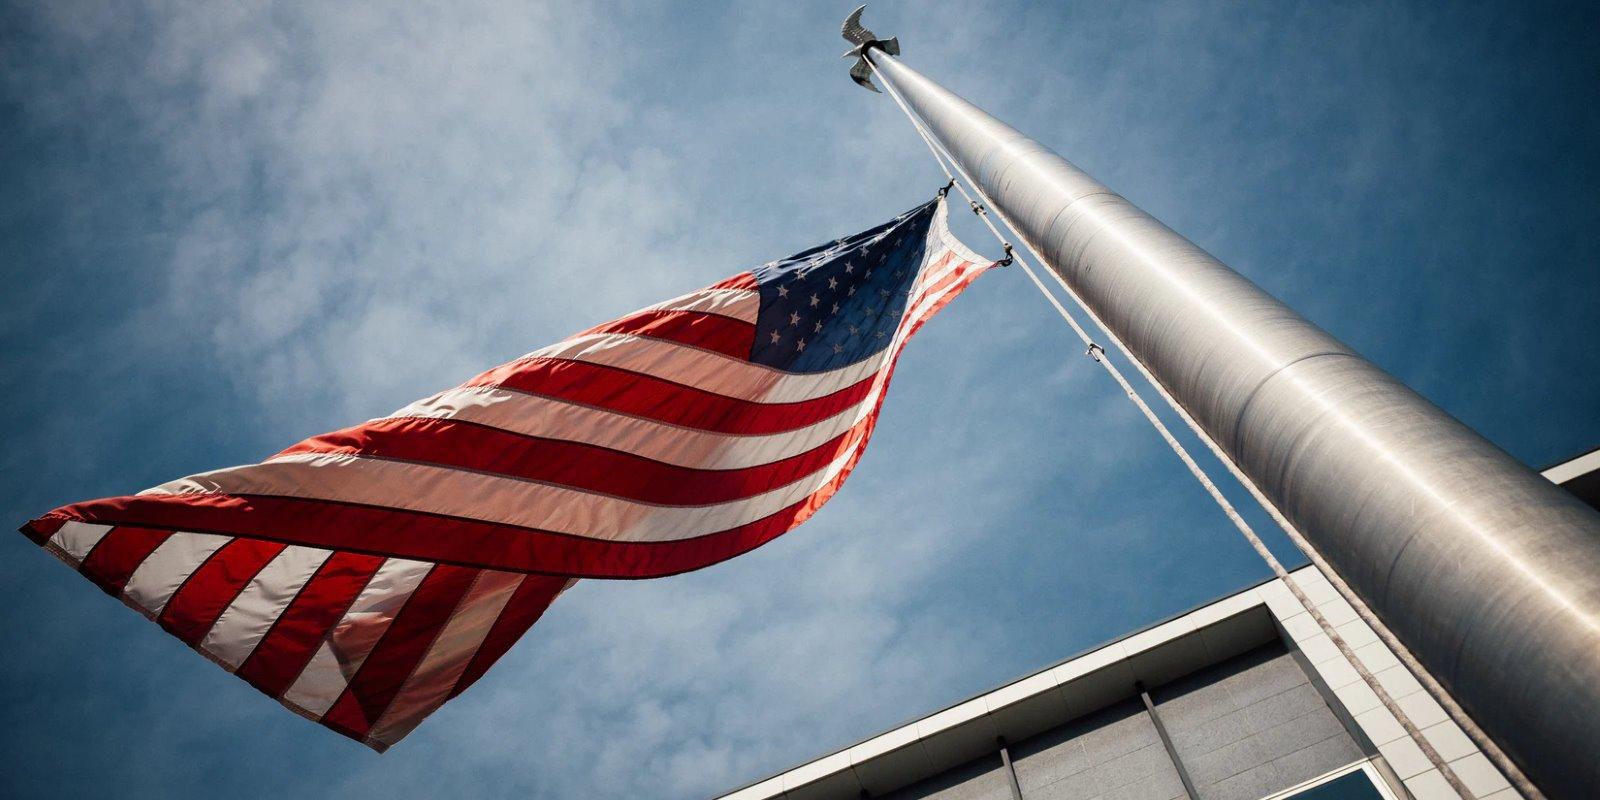 FBI, CISA officially confirm US govt hacks after SolarWinds breach